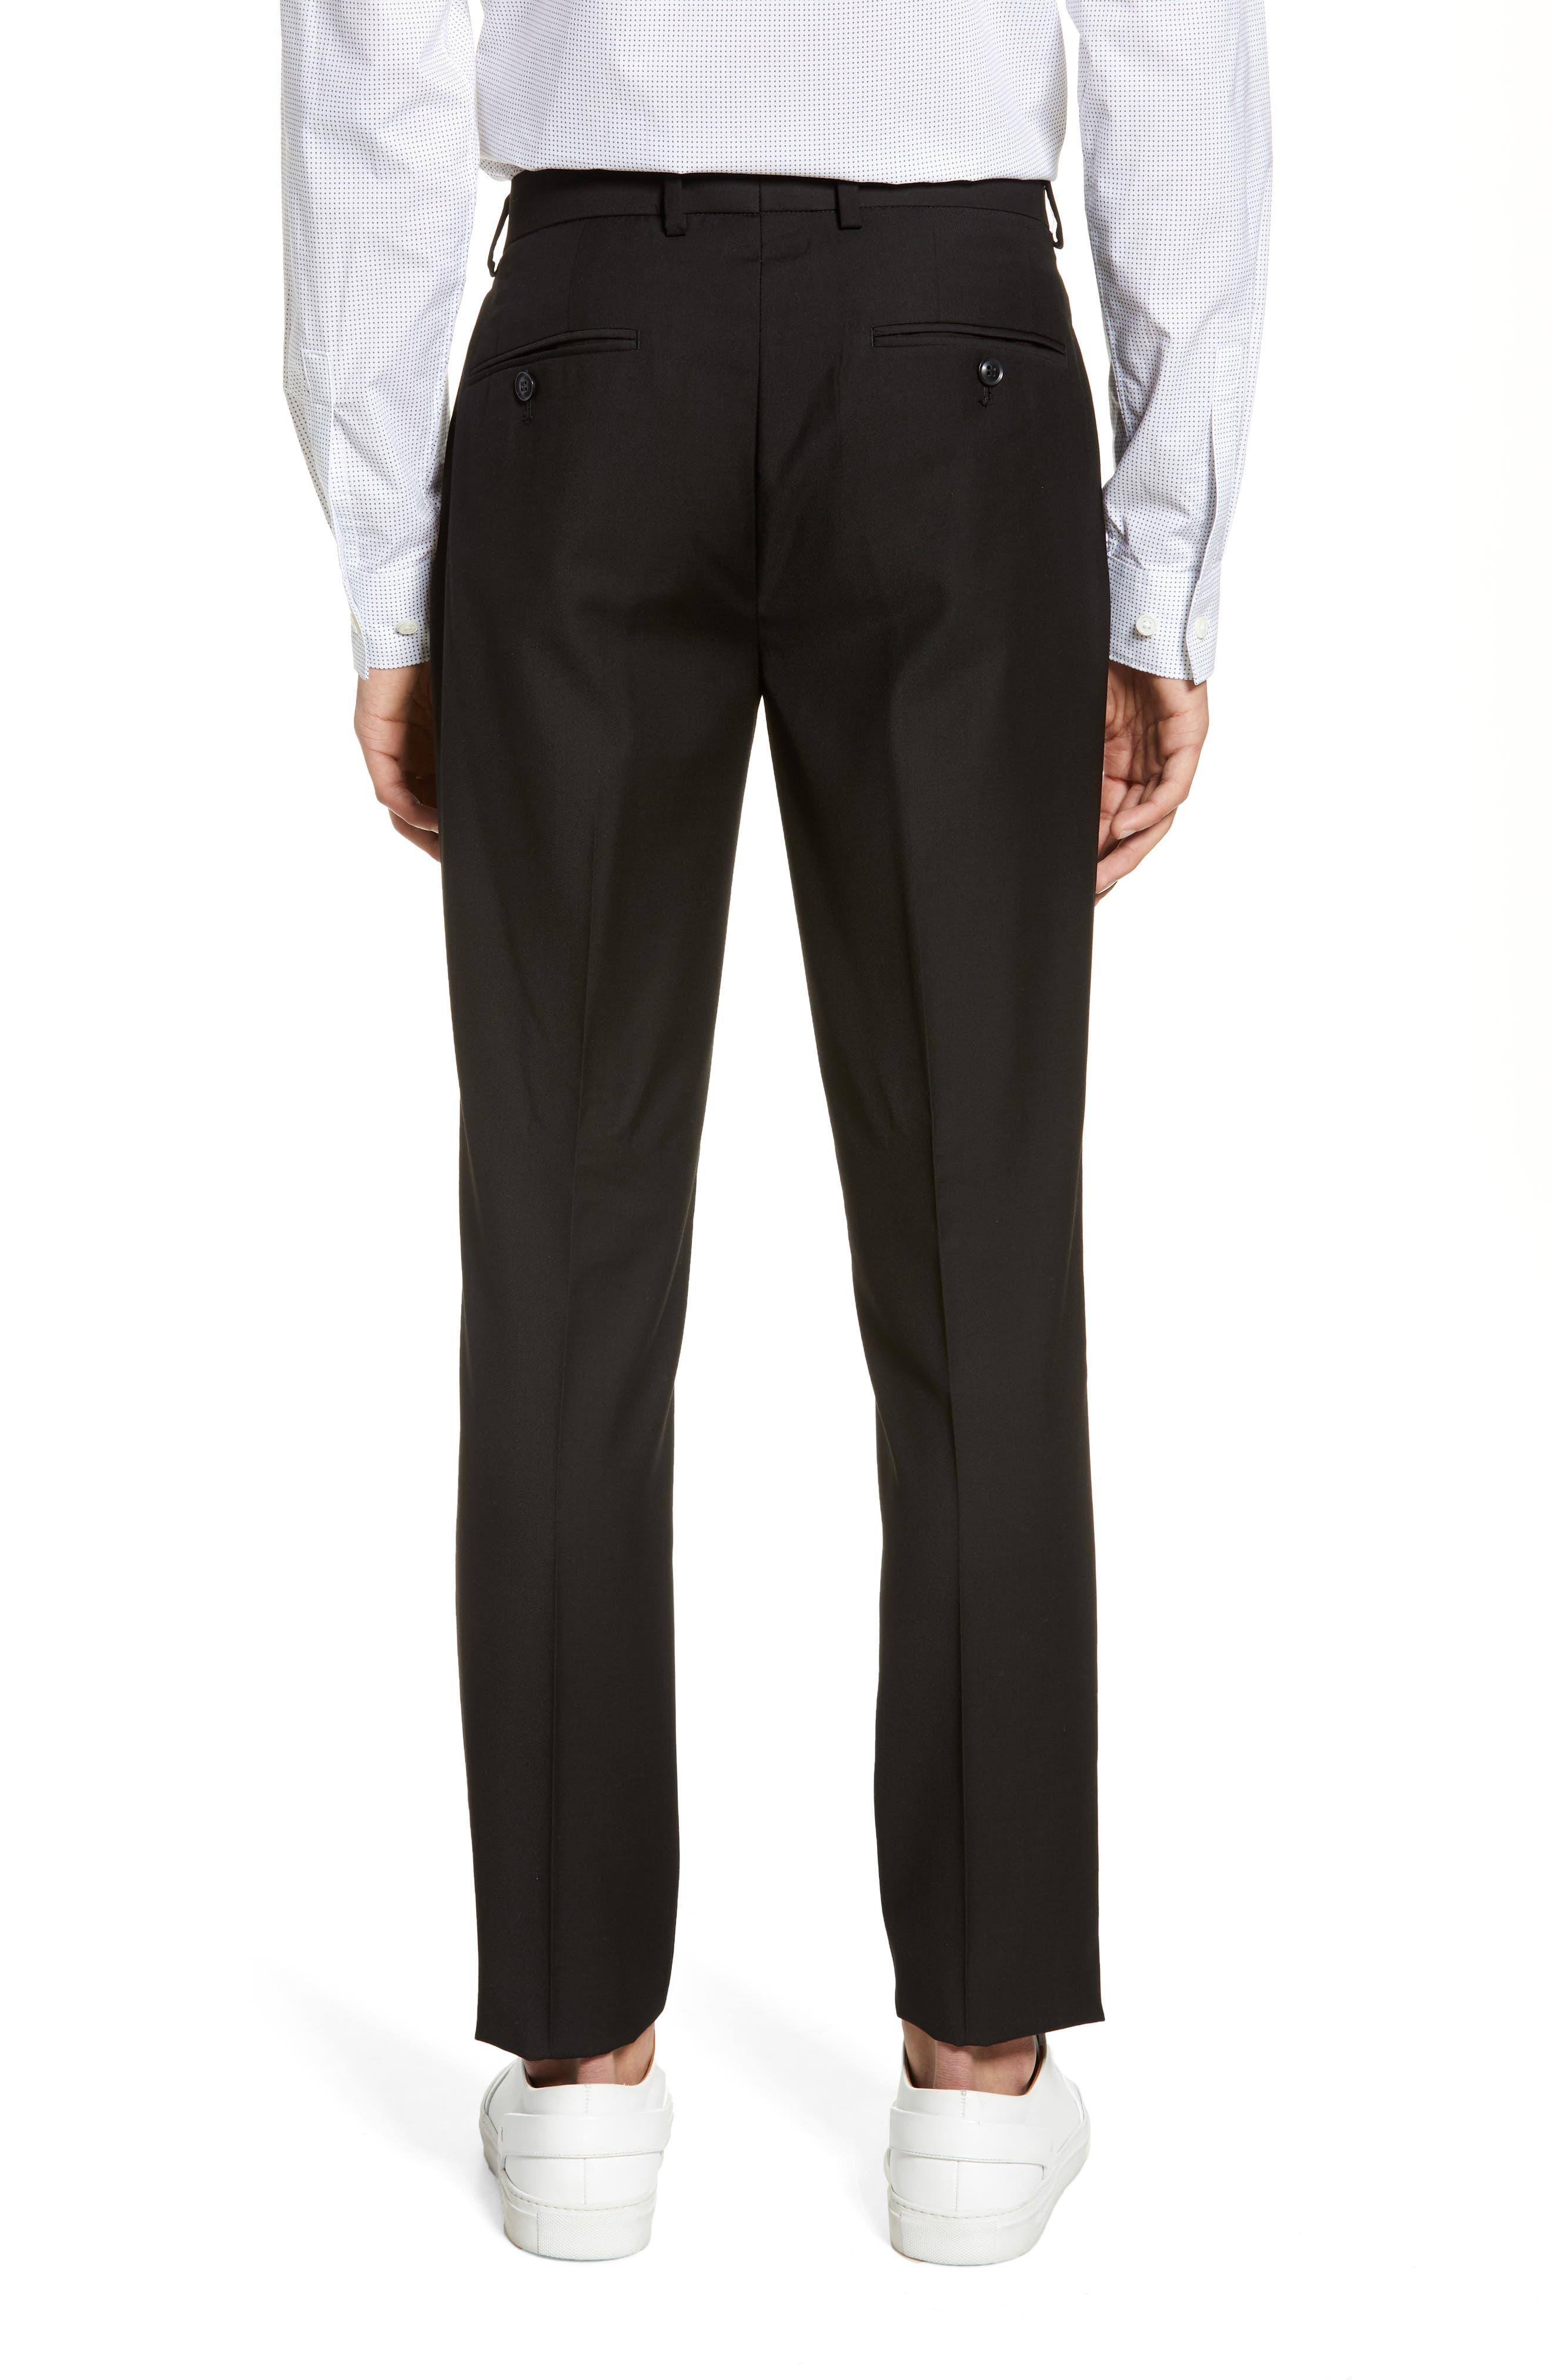 TOPMAN, Black Skinny Fit Trousers, Alternate thumbnail 2, color, BLACK